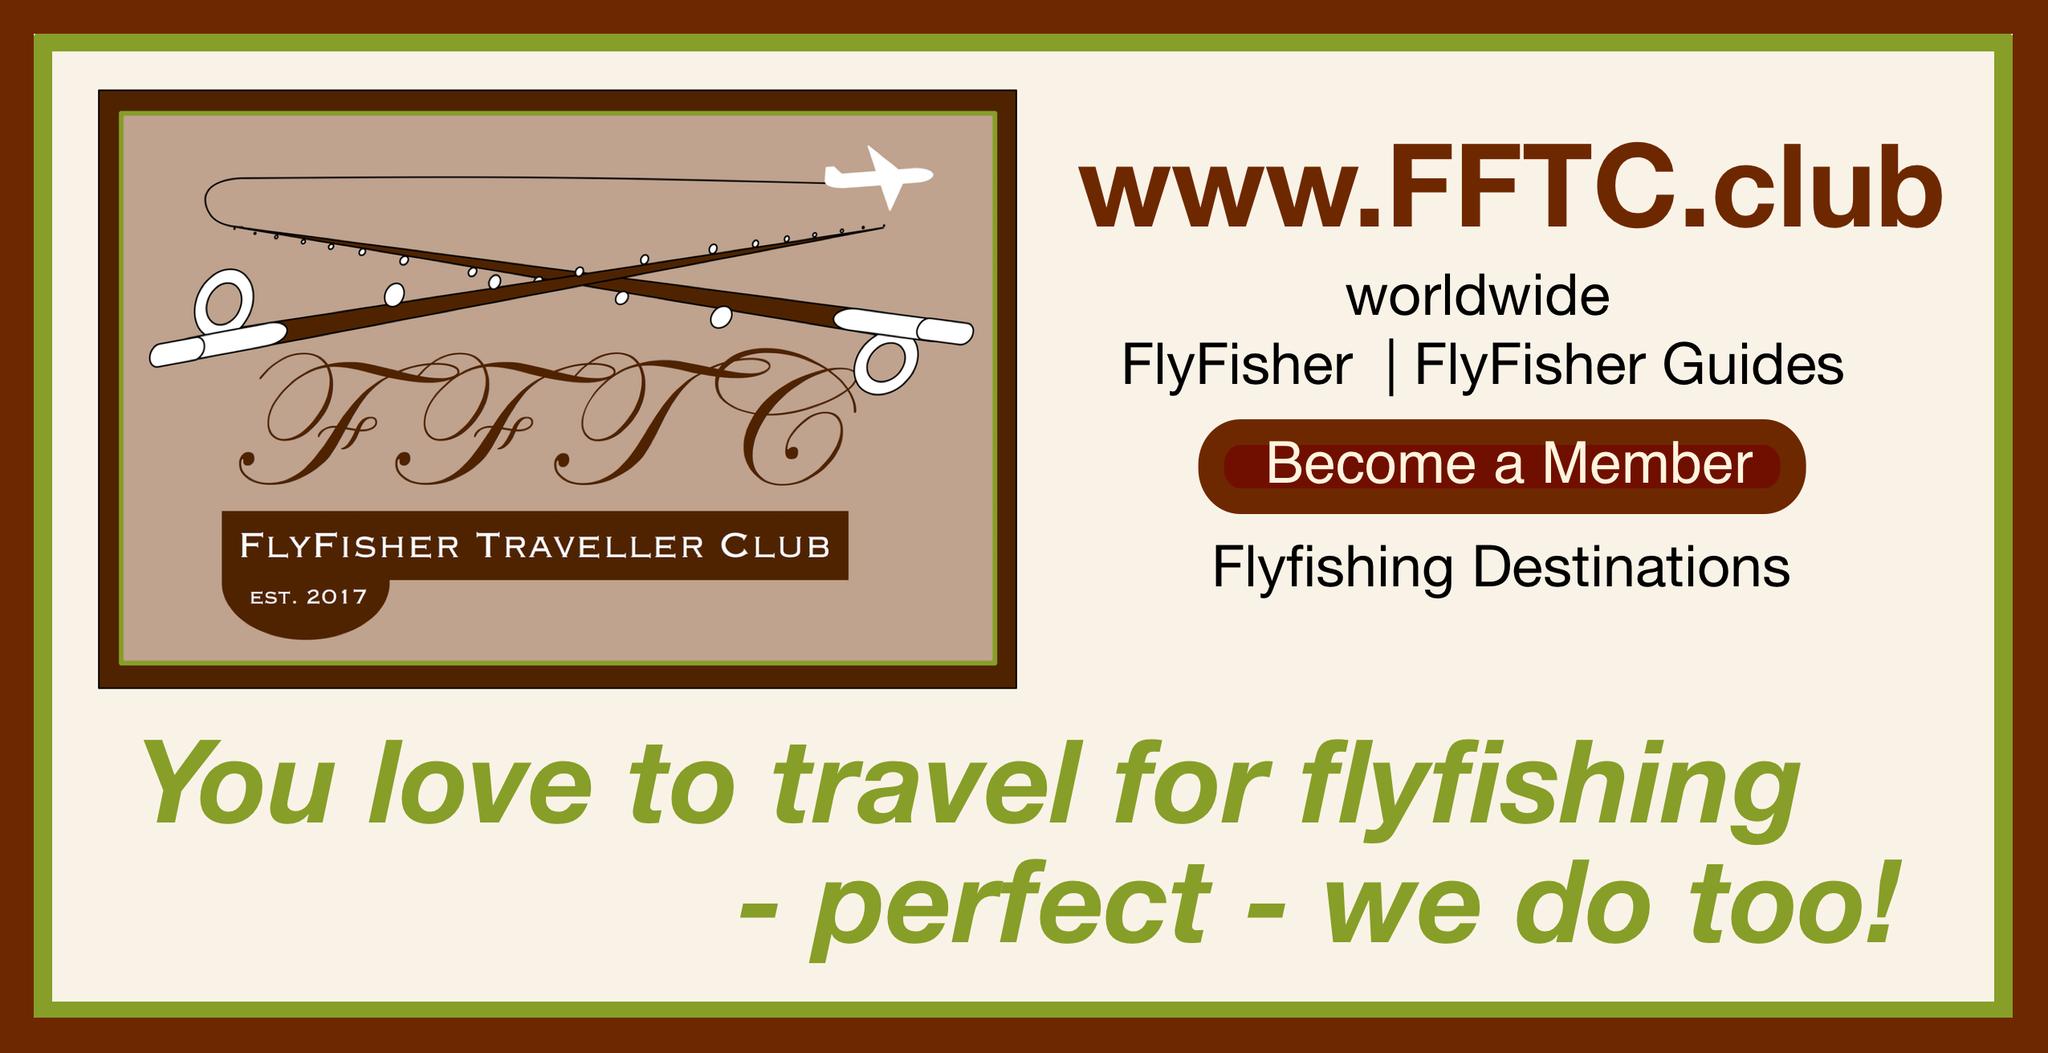 FFTC.club - Fly Fisher Membership - Frontside Flyer 2017!